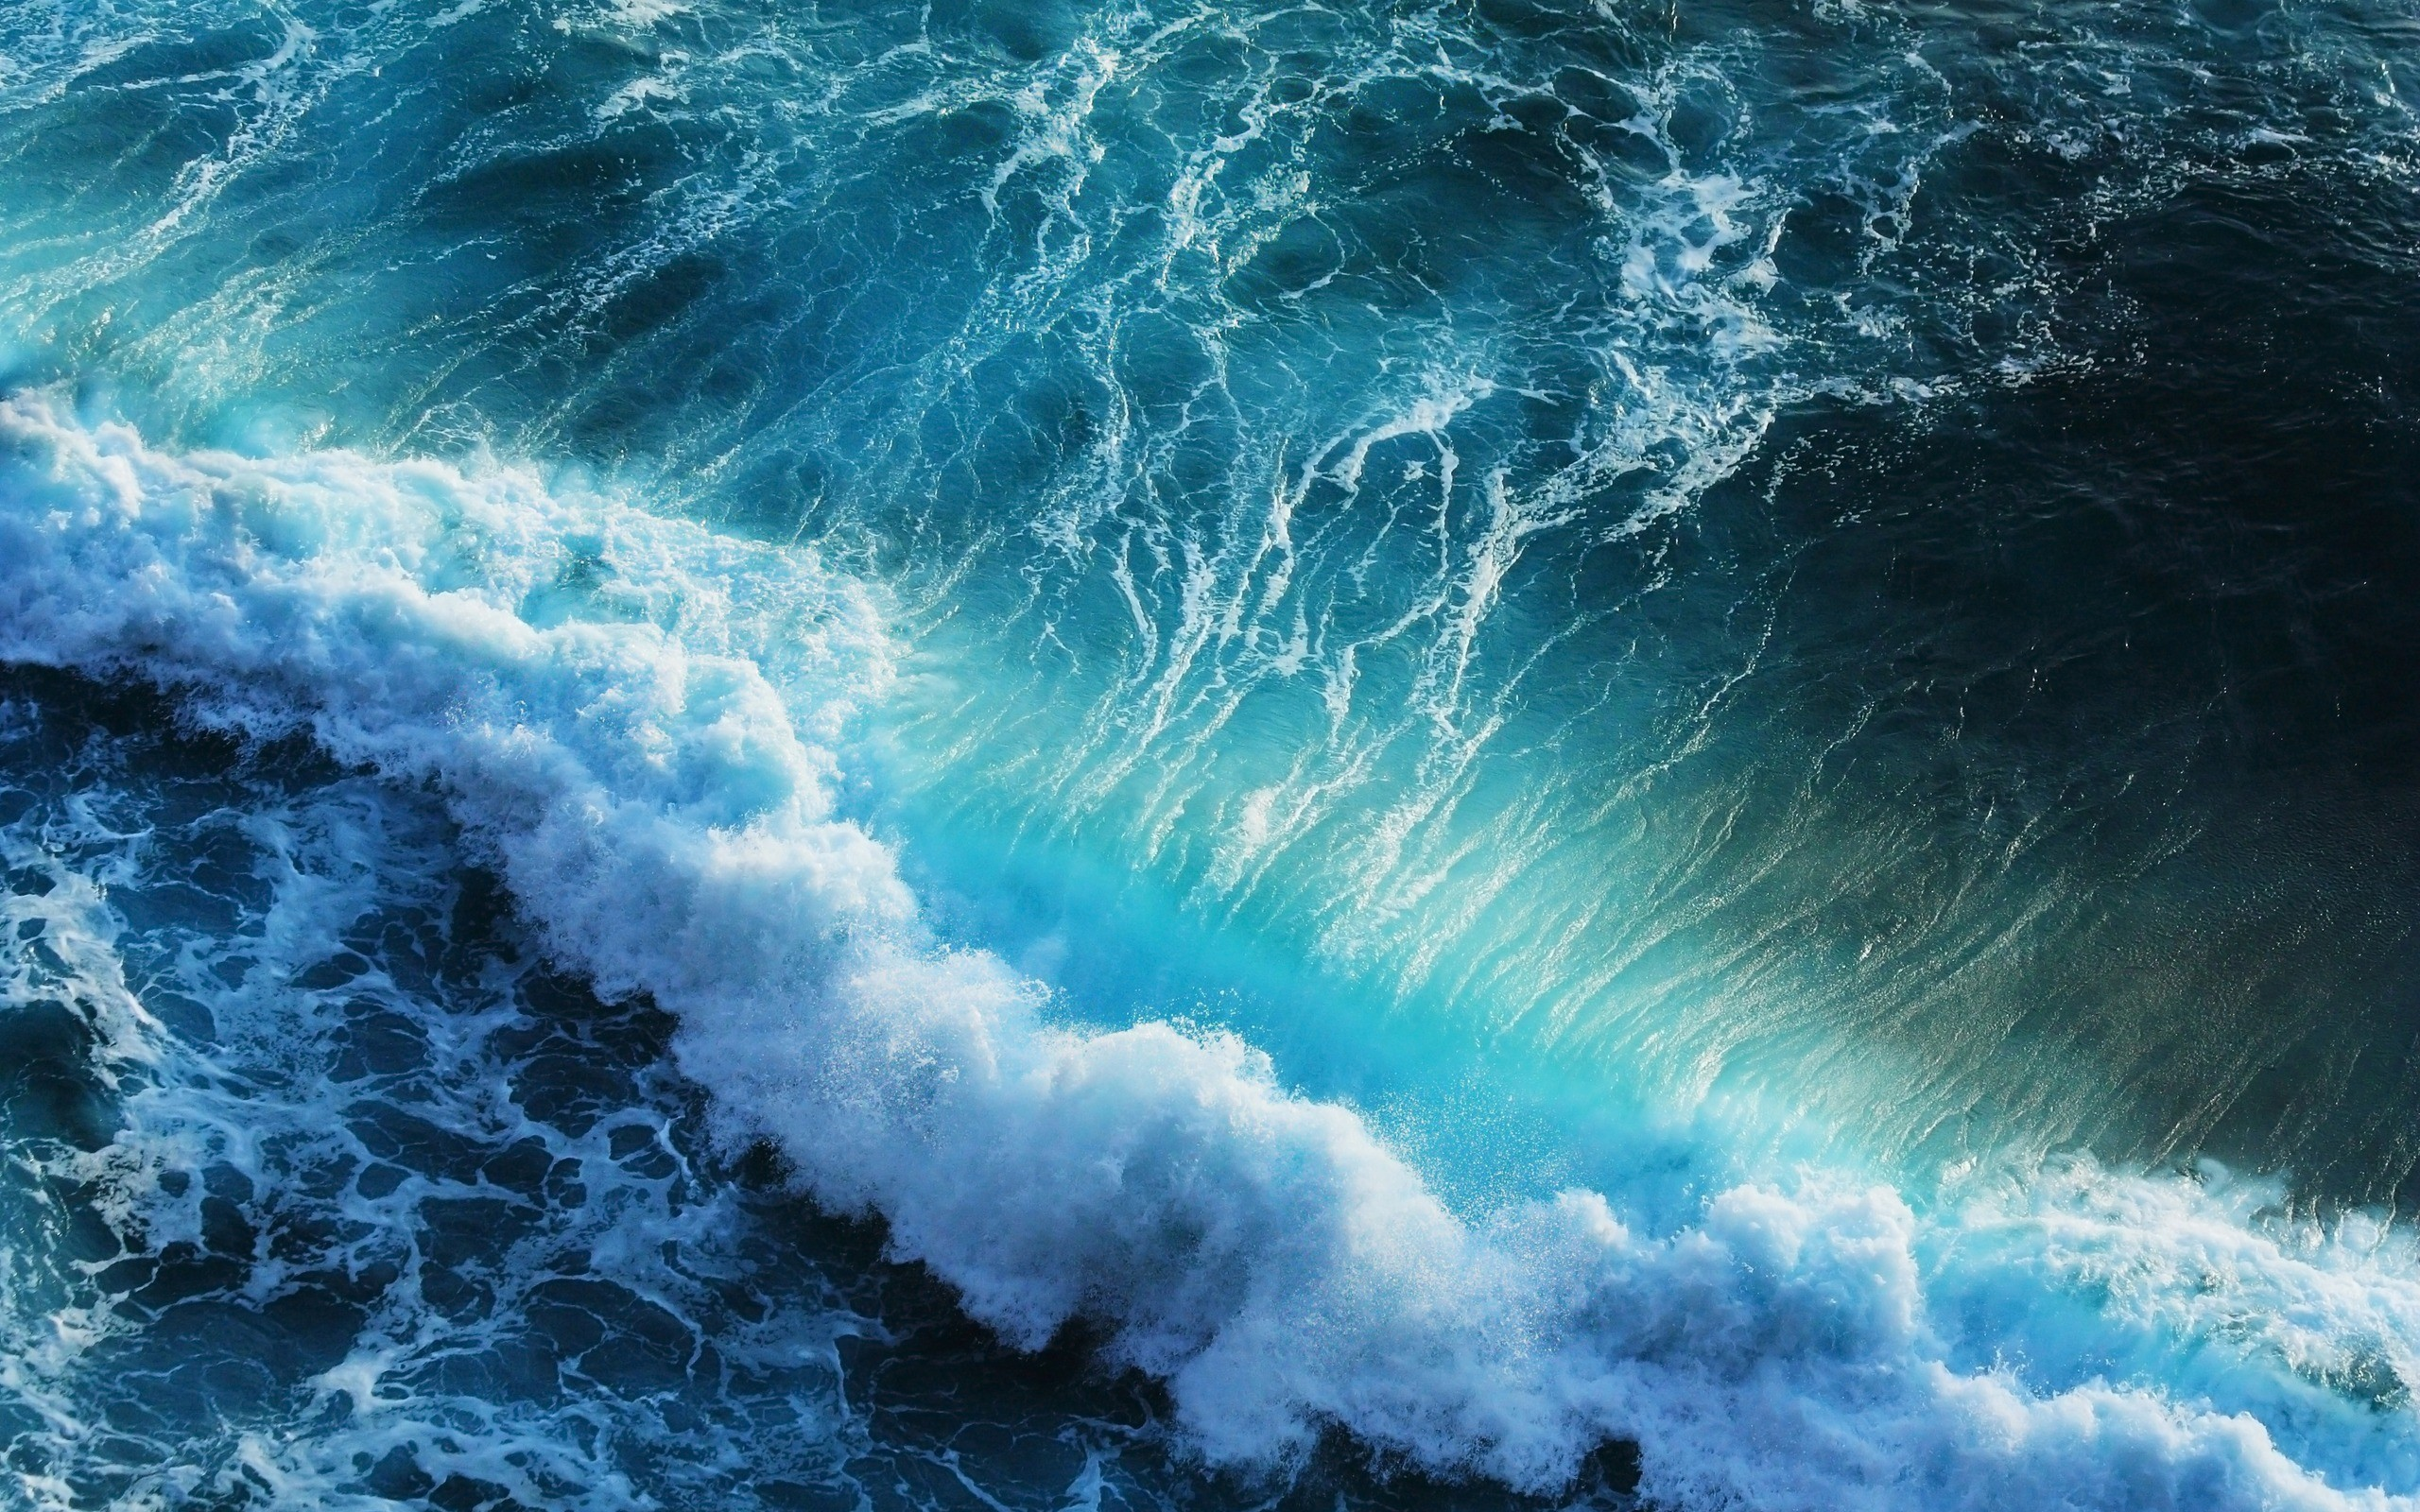 ocean waves wallpaper hd  60  images